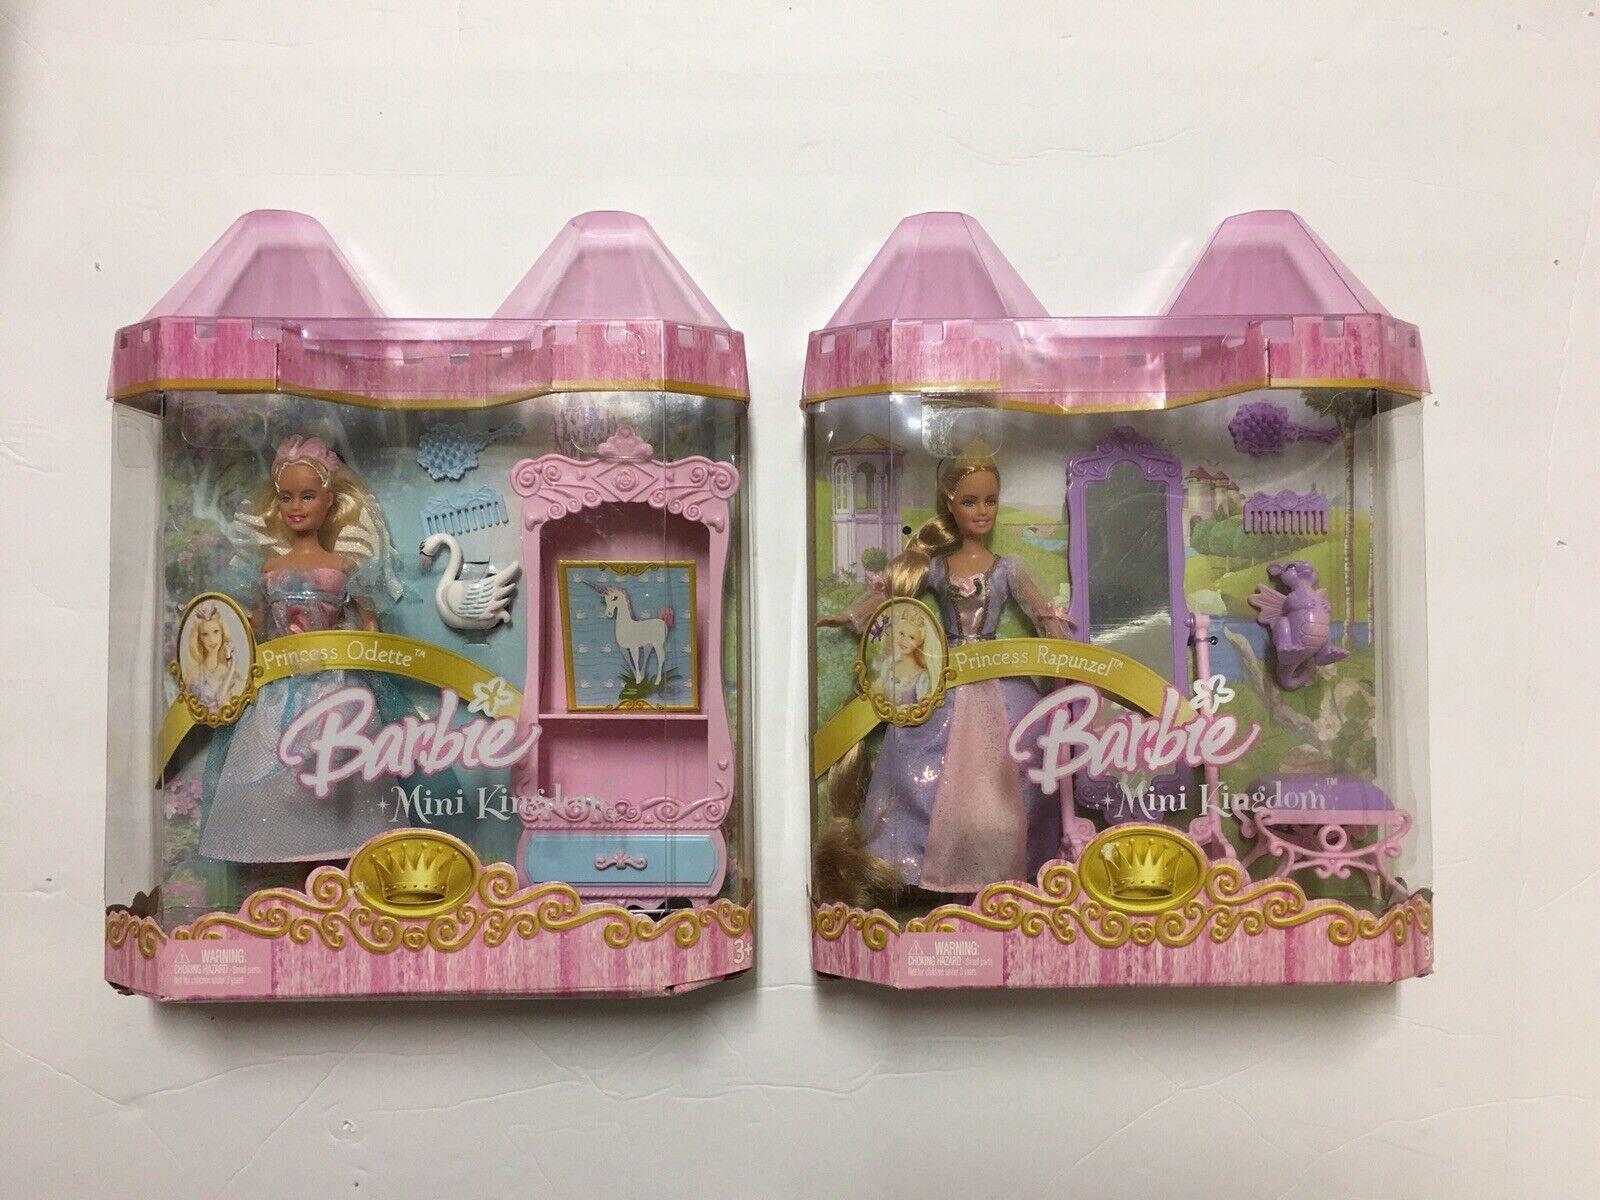 Barbie Princesa Odette Mini Reino y Princesa Princesa Princesa Rapunzel 2005 Totalmente Nuevo  100% precio garantizado